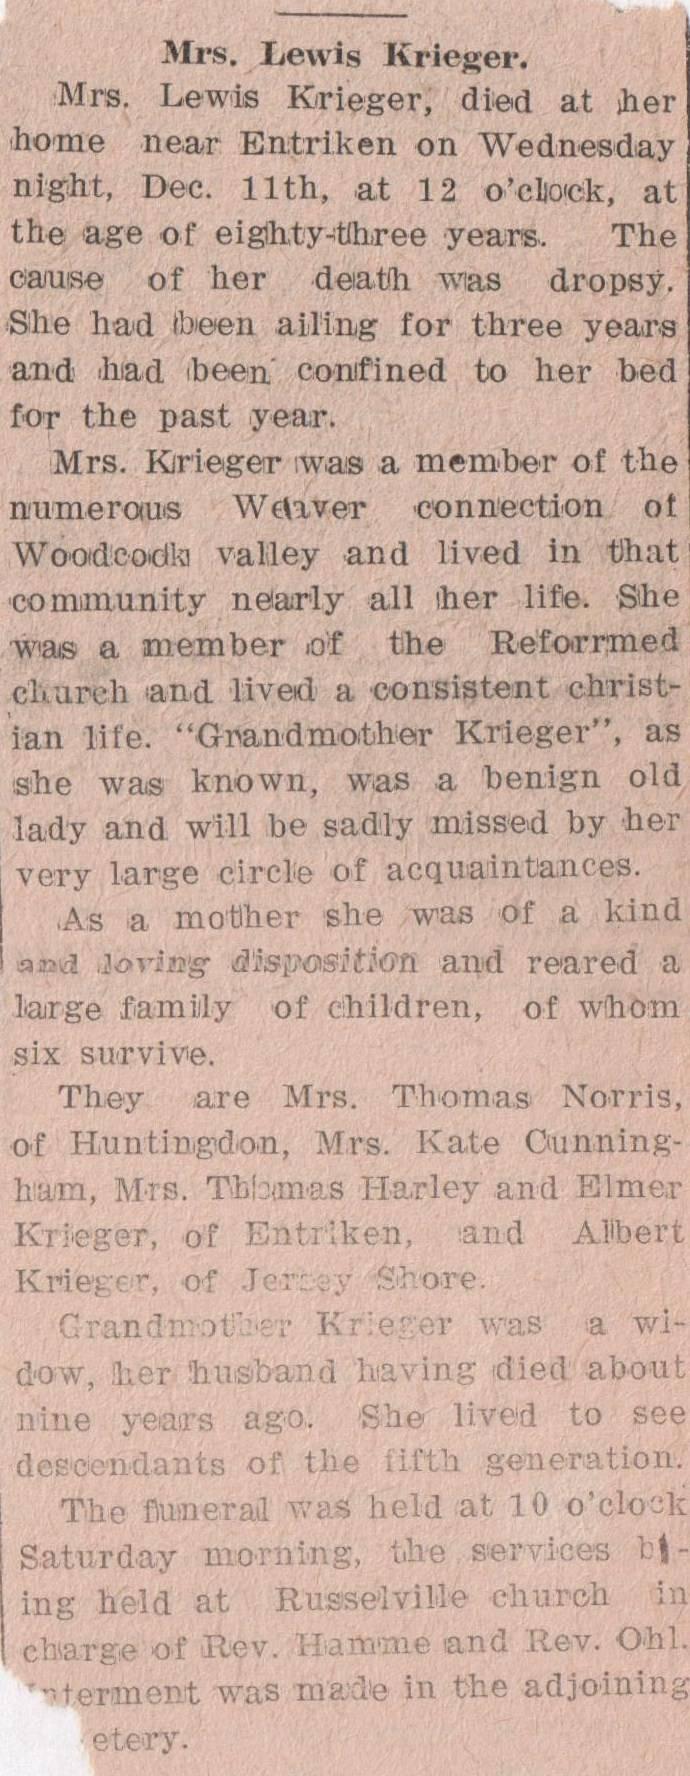 Krieger, Mrs. Lewis 1912